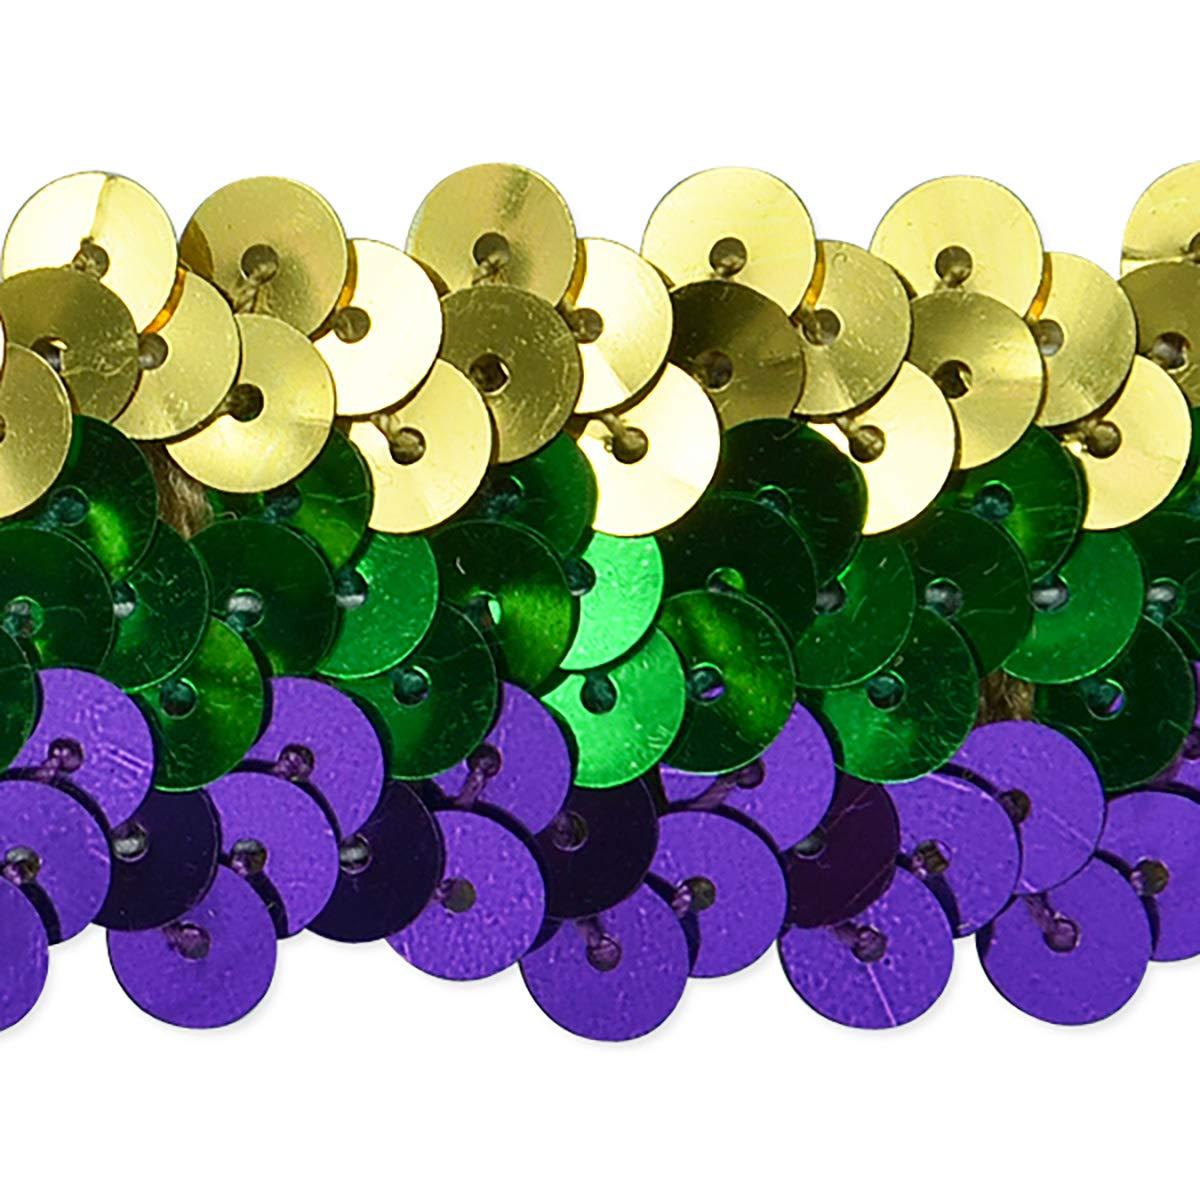 3 Row 1 1/4in Metallic Mardis Gras Stretch Sequin Trim Multi Colors (Precut 20 Yard) by Expo International Inc.